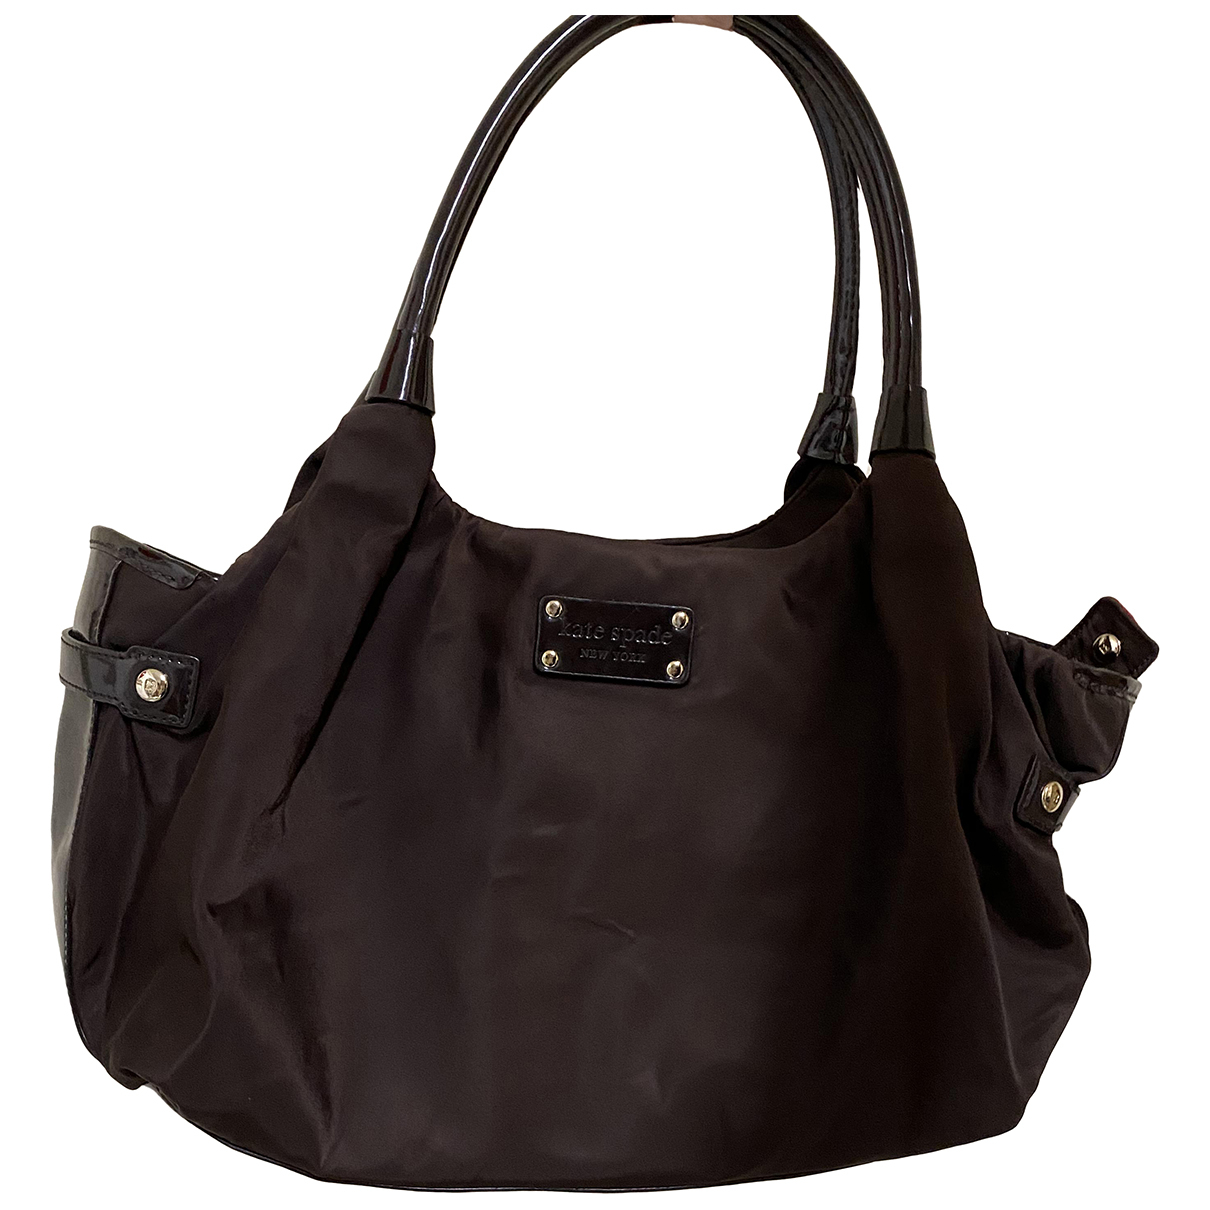 Kate Spade \N Handtasche in  Braun Synthetik